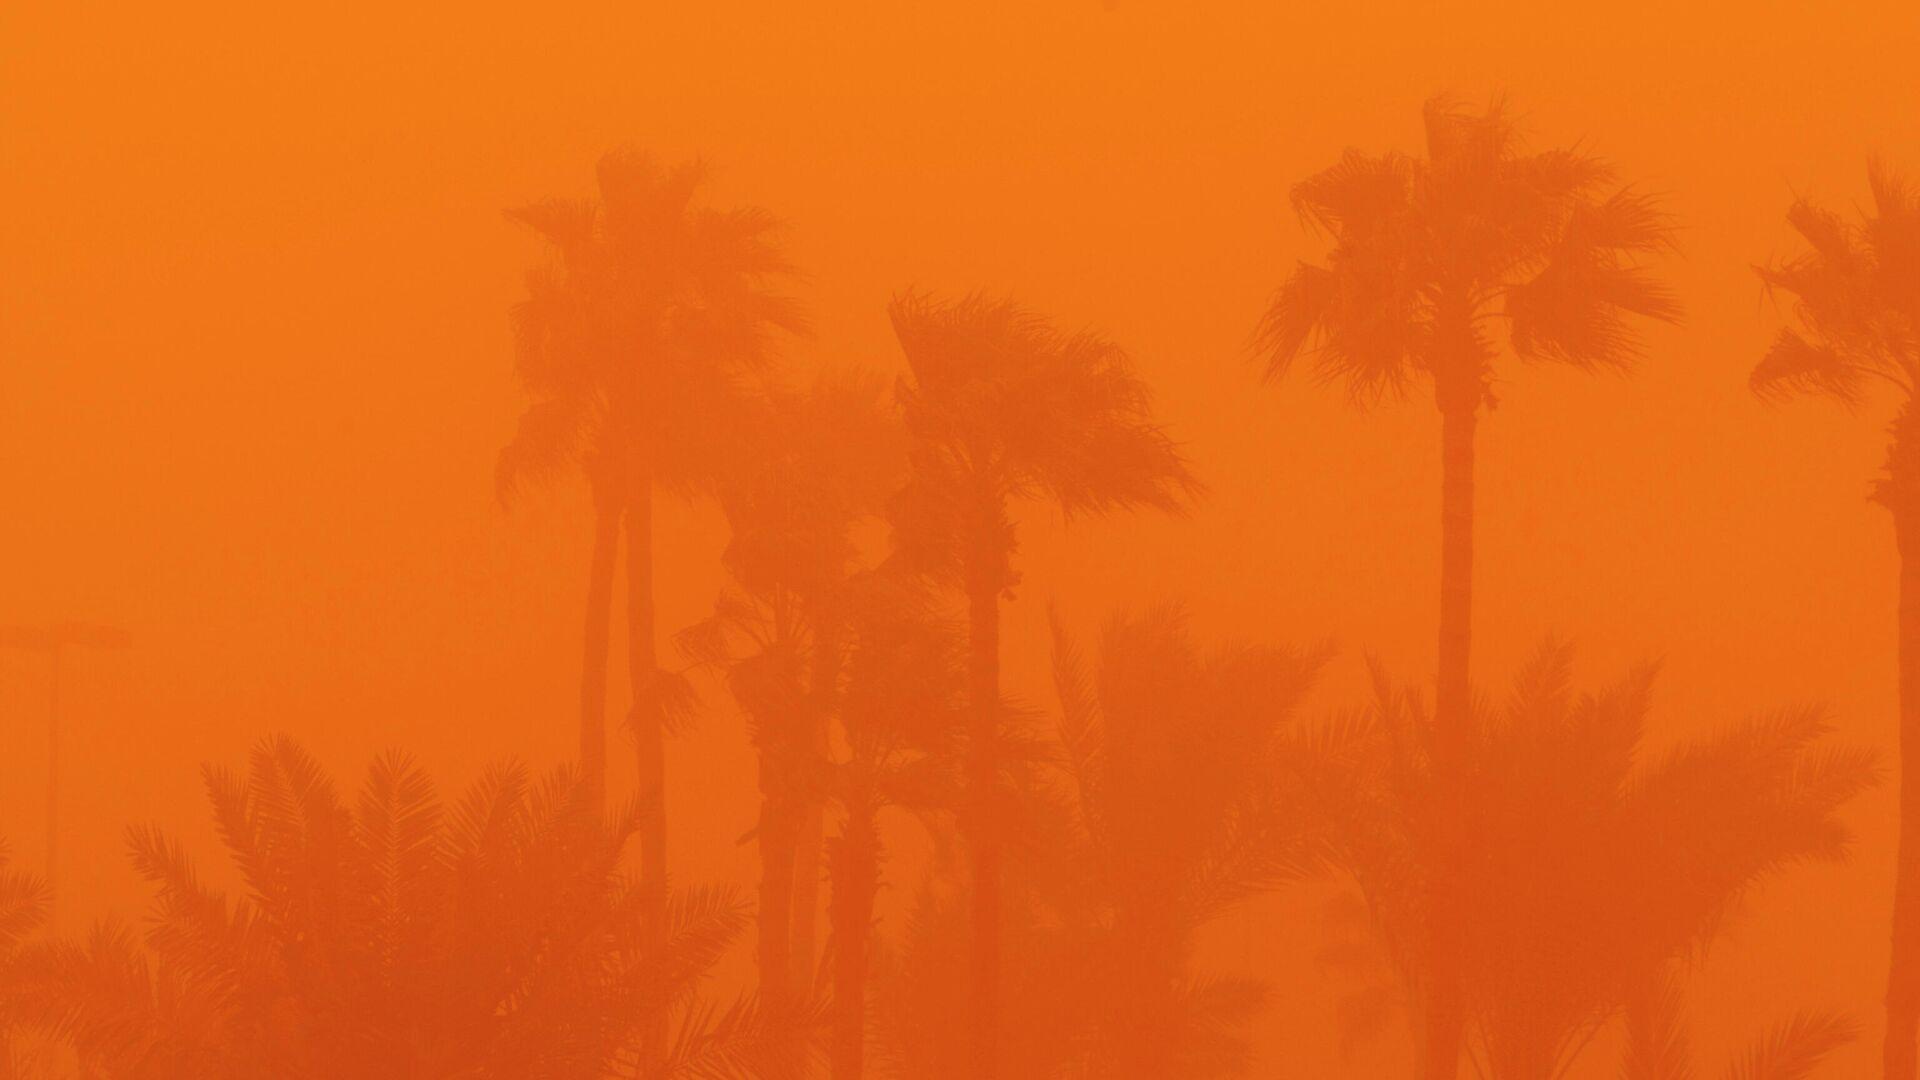 Una tormenta de arena en Arabia Saudi en 2009 - Sputnik Mundo, 1920, 15.03.2021